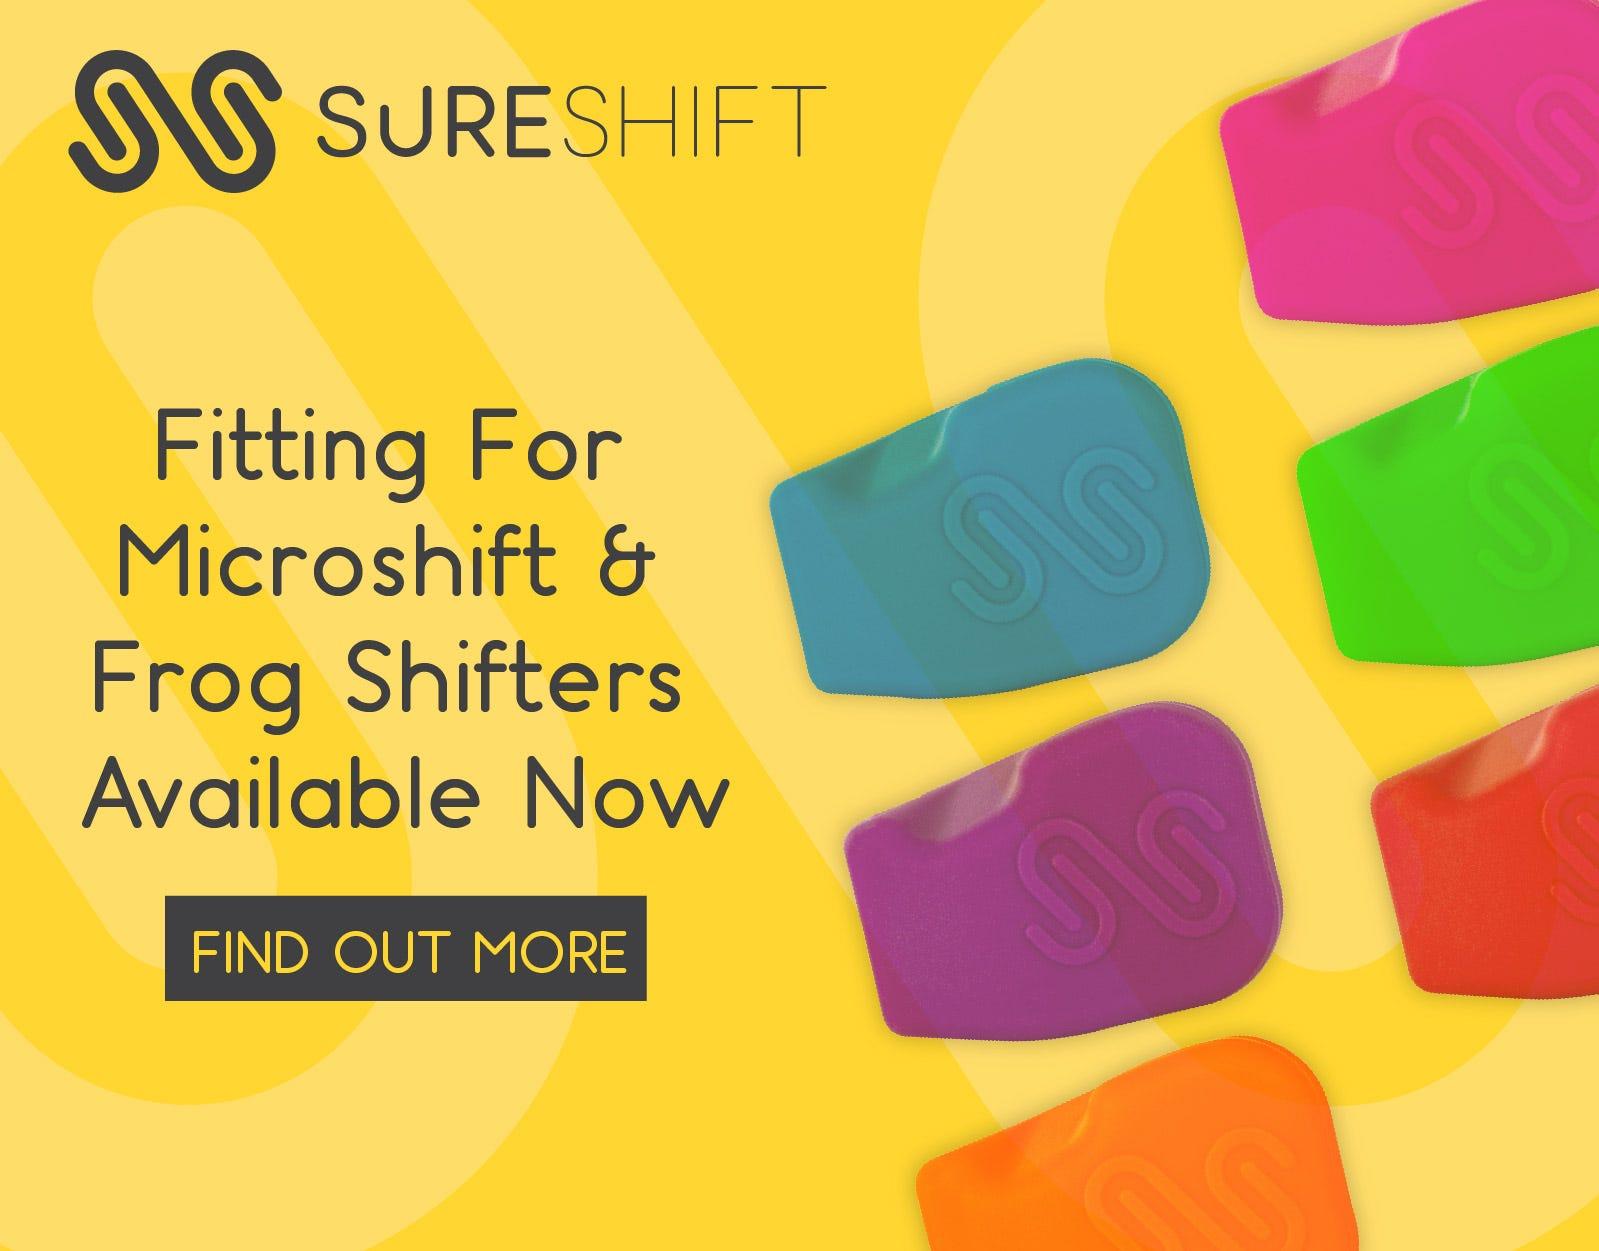 SureShift Microshift